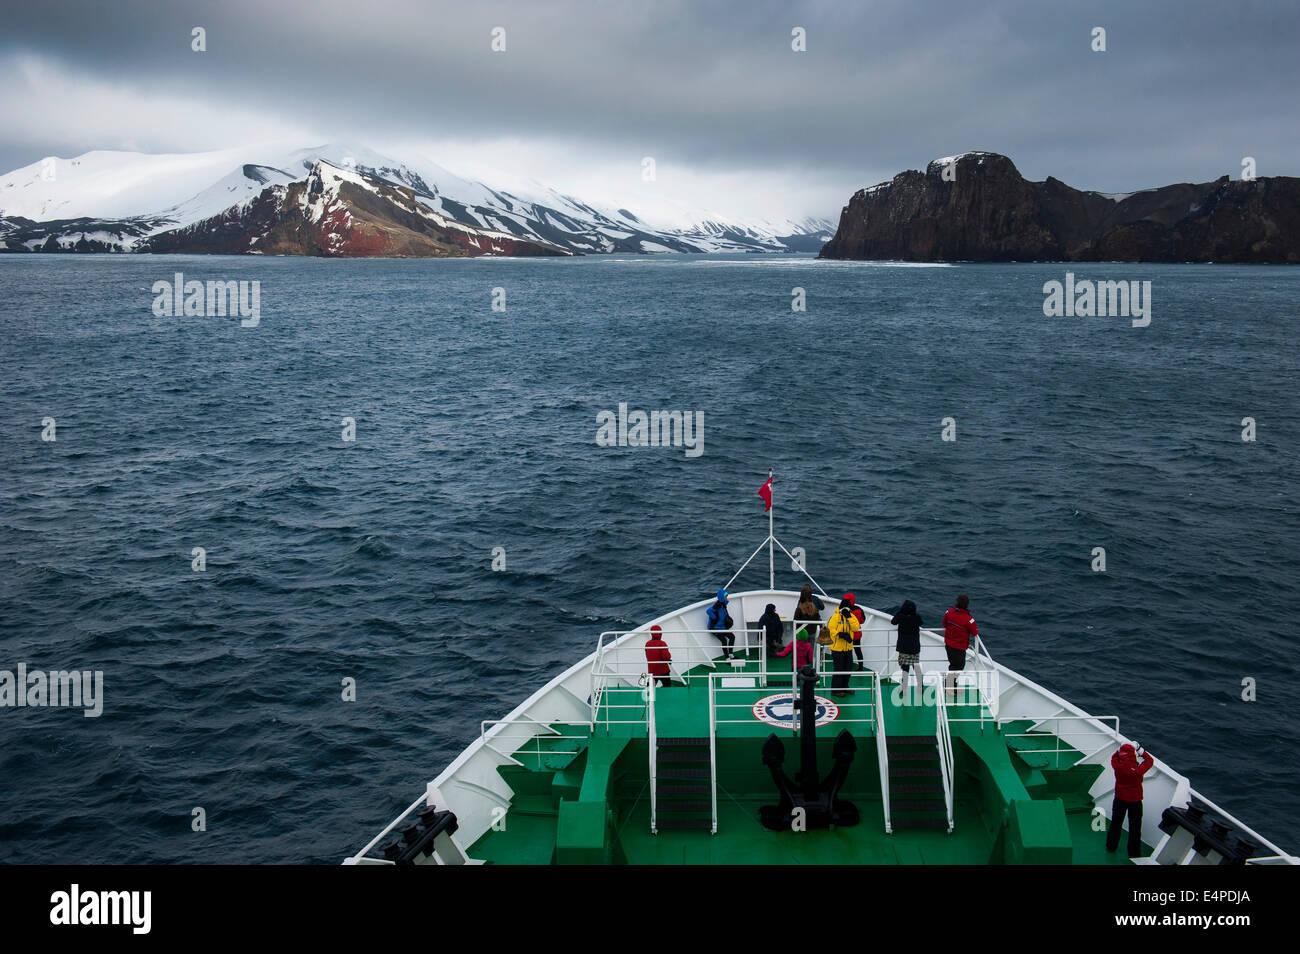 Cruise ship approaching Deception Island, South Shetlands, Antarctica - Stock Image